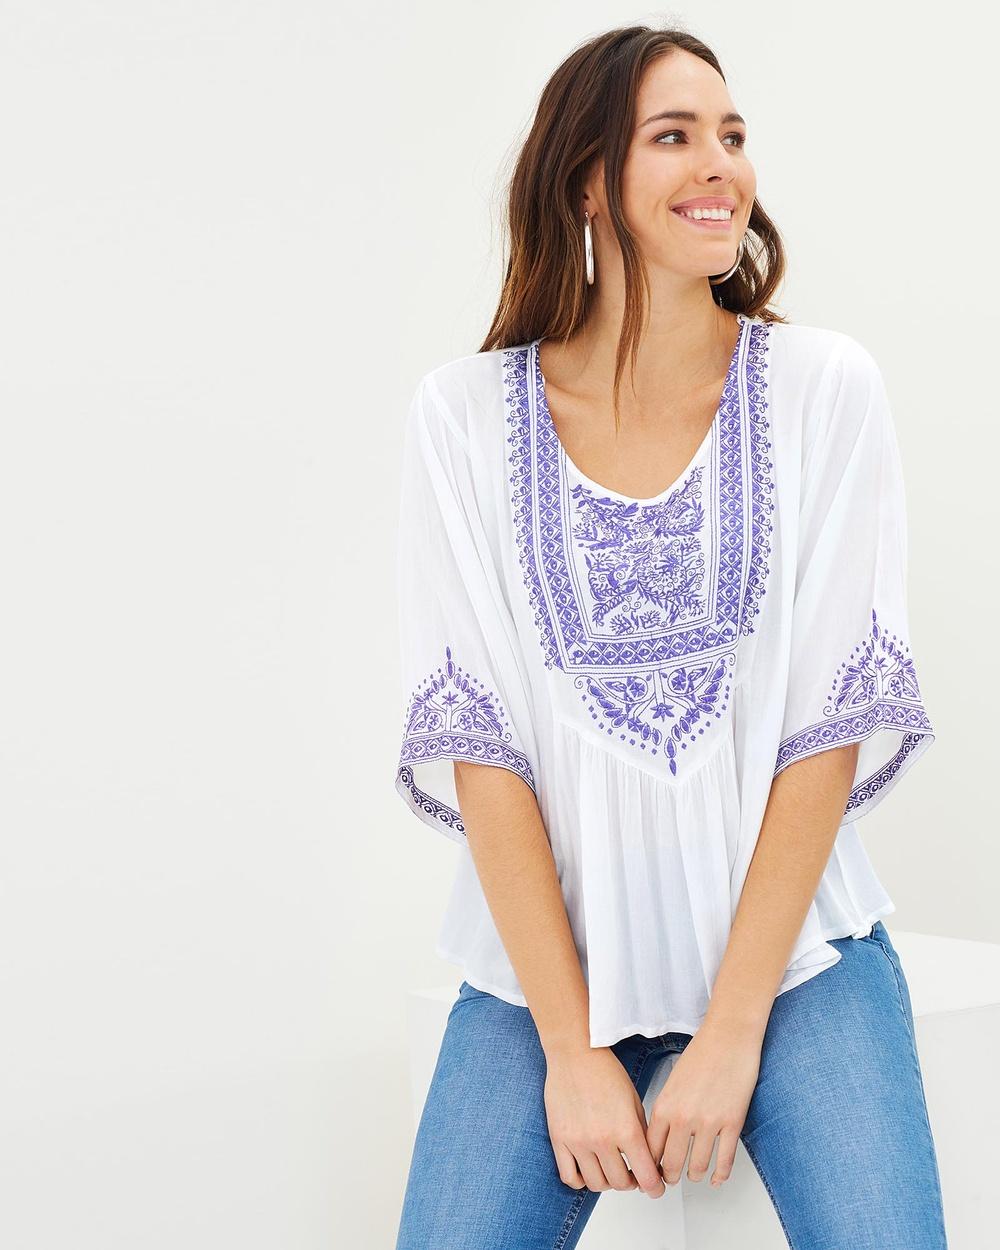 Kaja Clothing Brionna Top Tops Violet Brionna Top